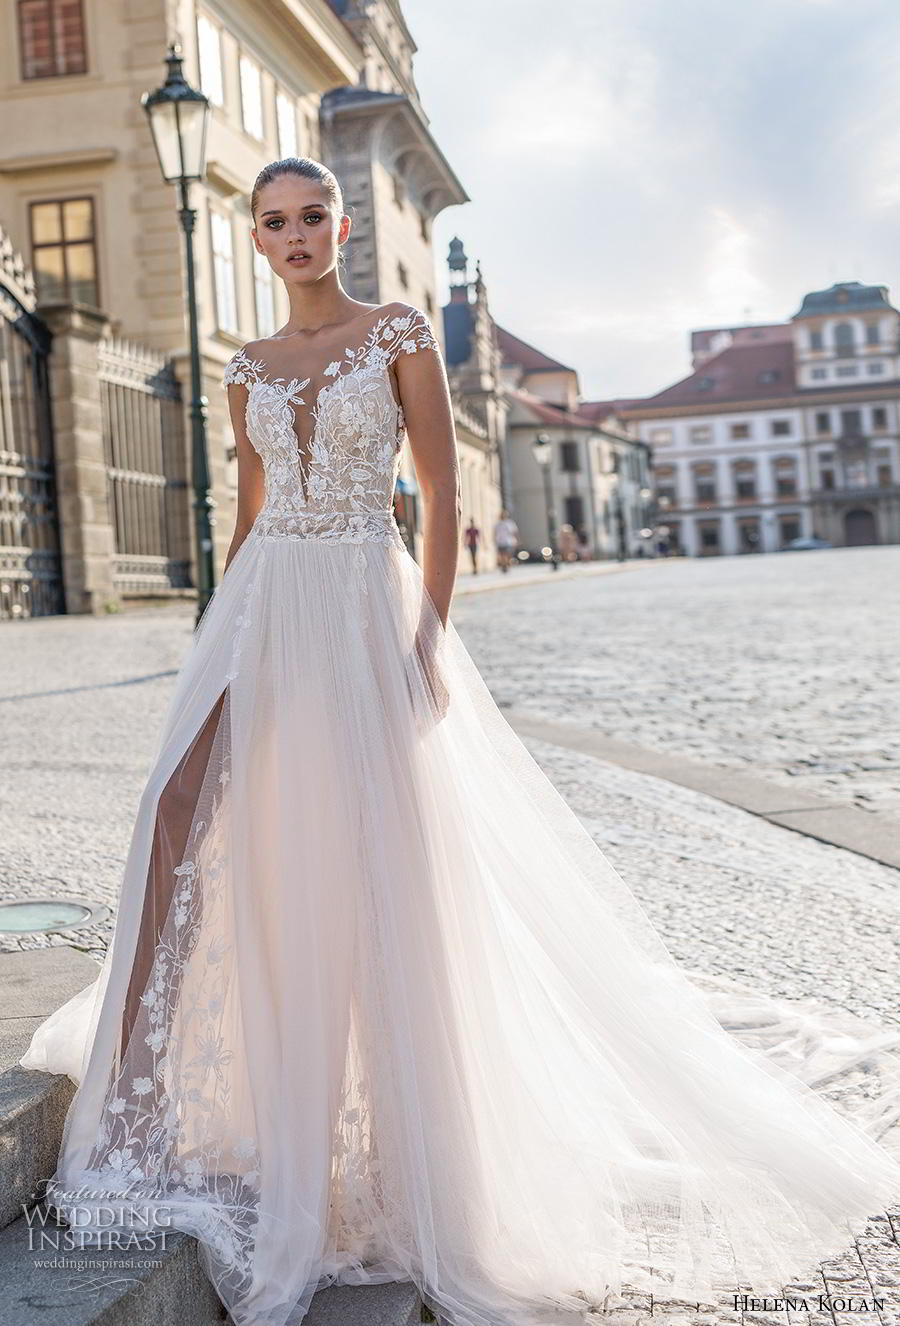 helena kolan 2019 bridal cap sleeves deep plunging sweetheart neckline heavily embellished bodice slit skirt romantic a  line wedding dress sheer button back chapel train (7) mv